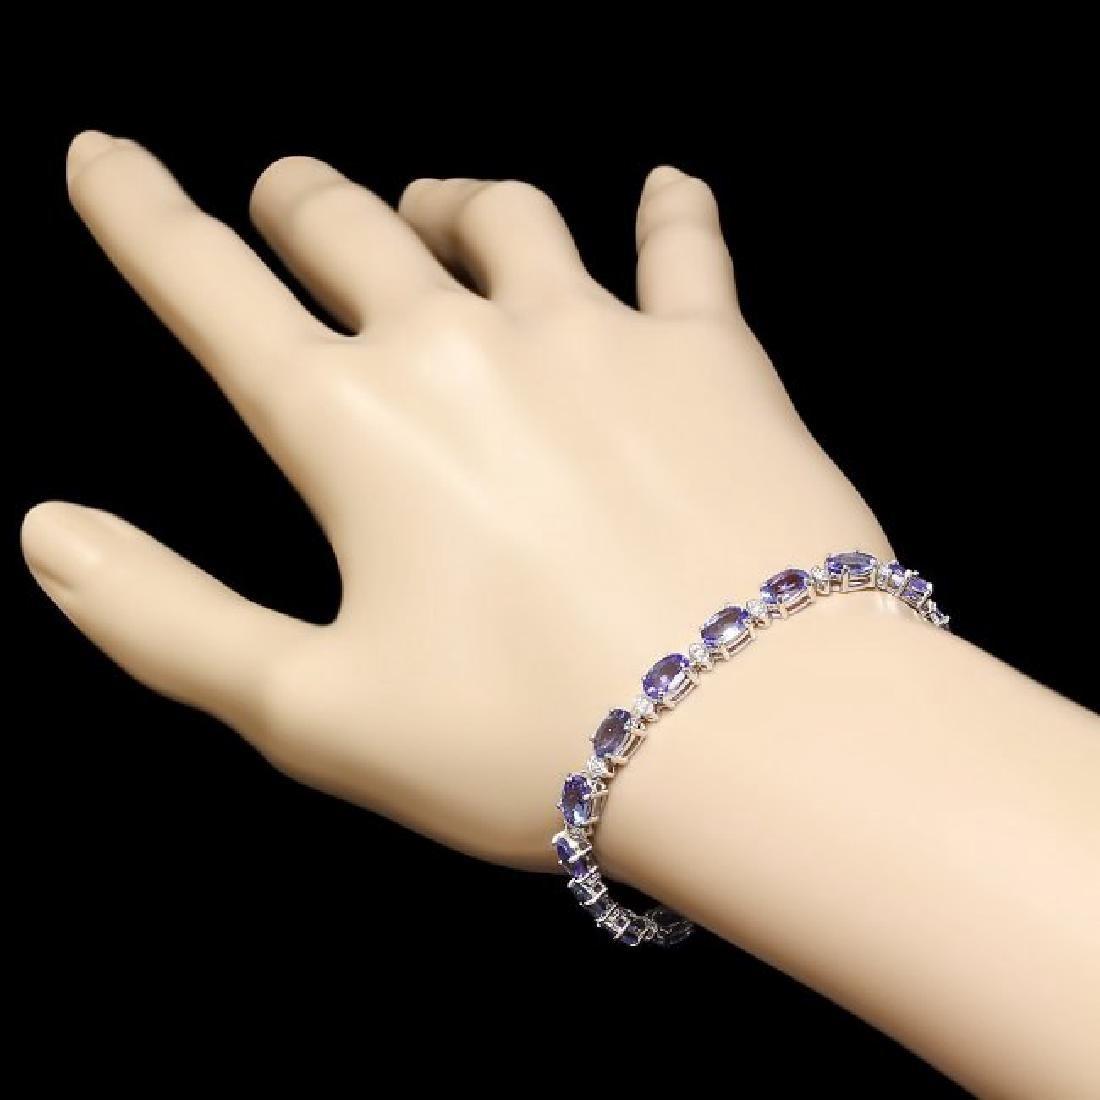 14k Gold 14ct Tanzanite 0.60ct Diamond Bracelet - 5